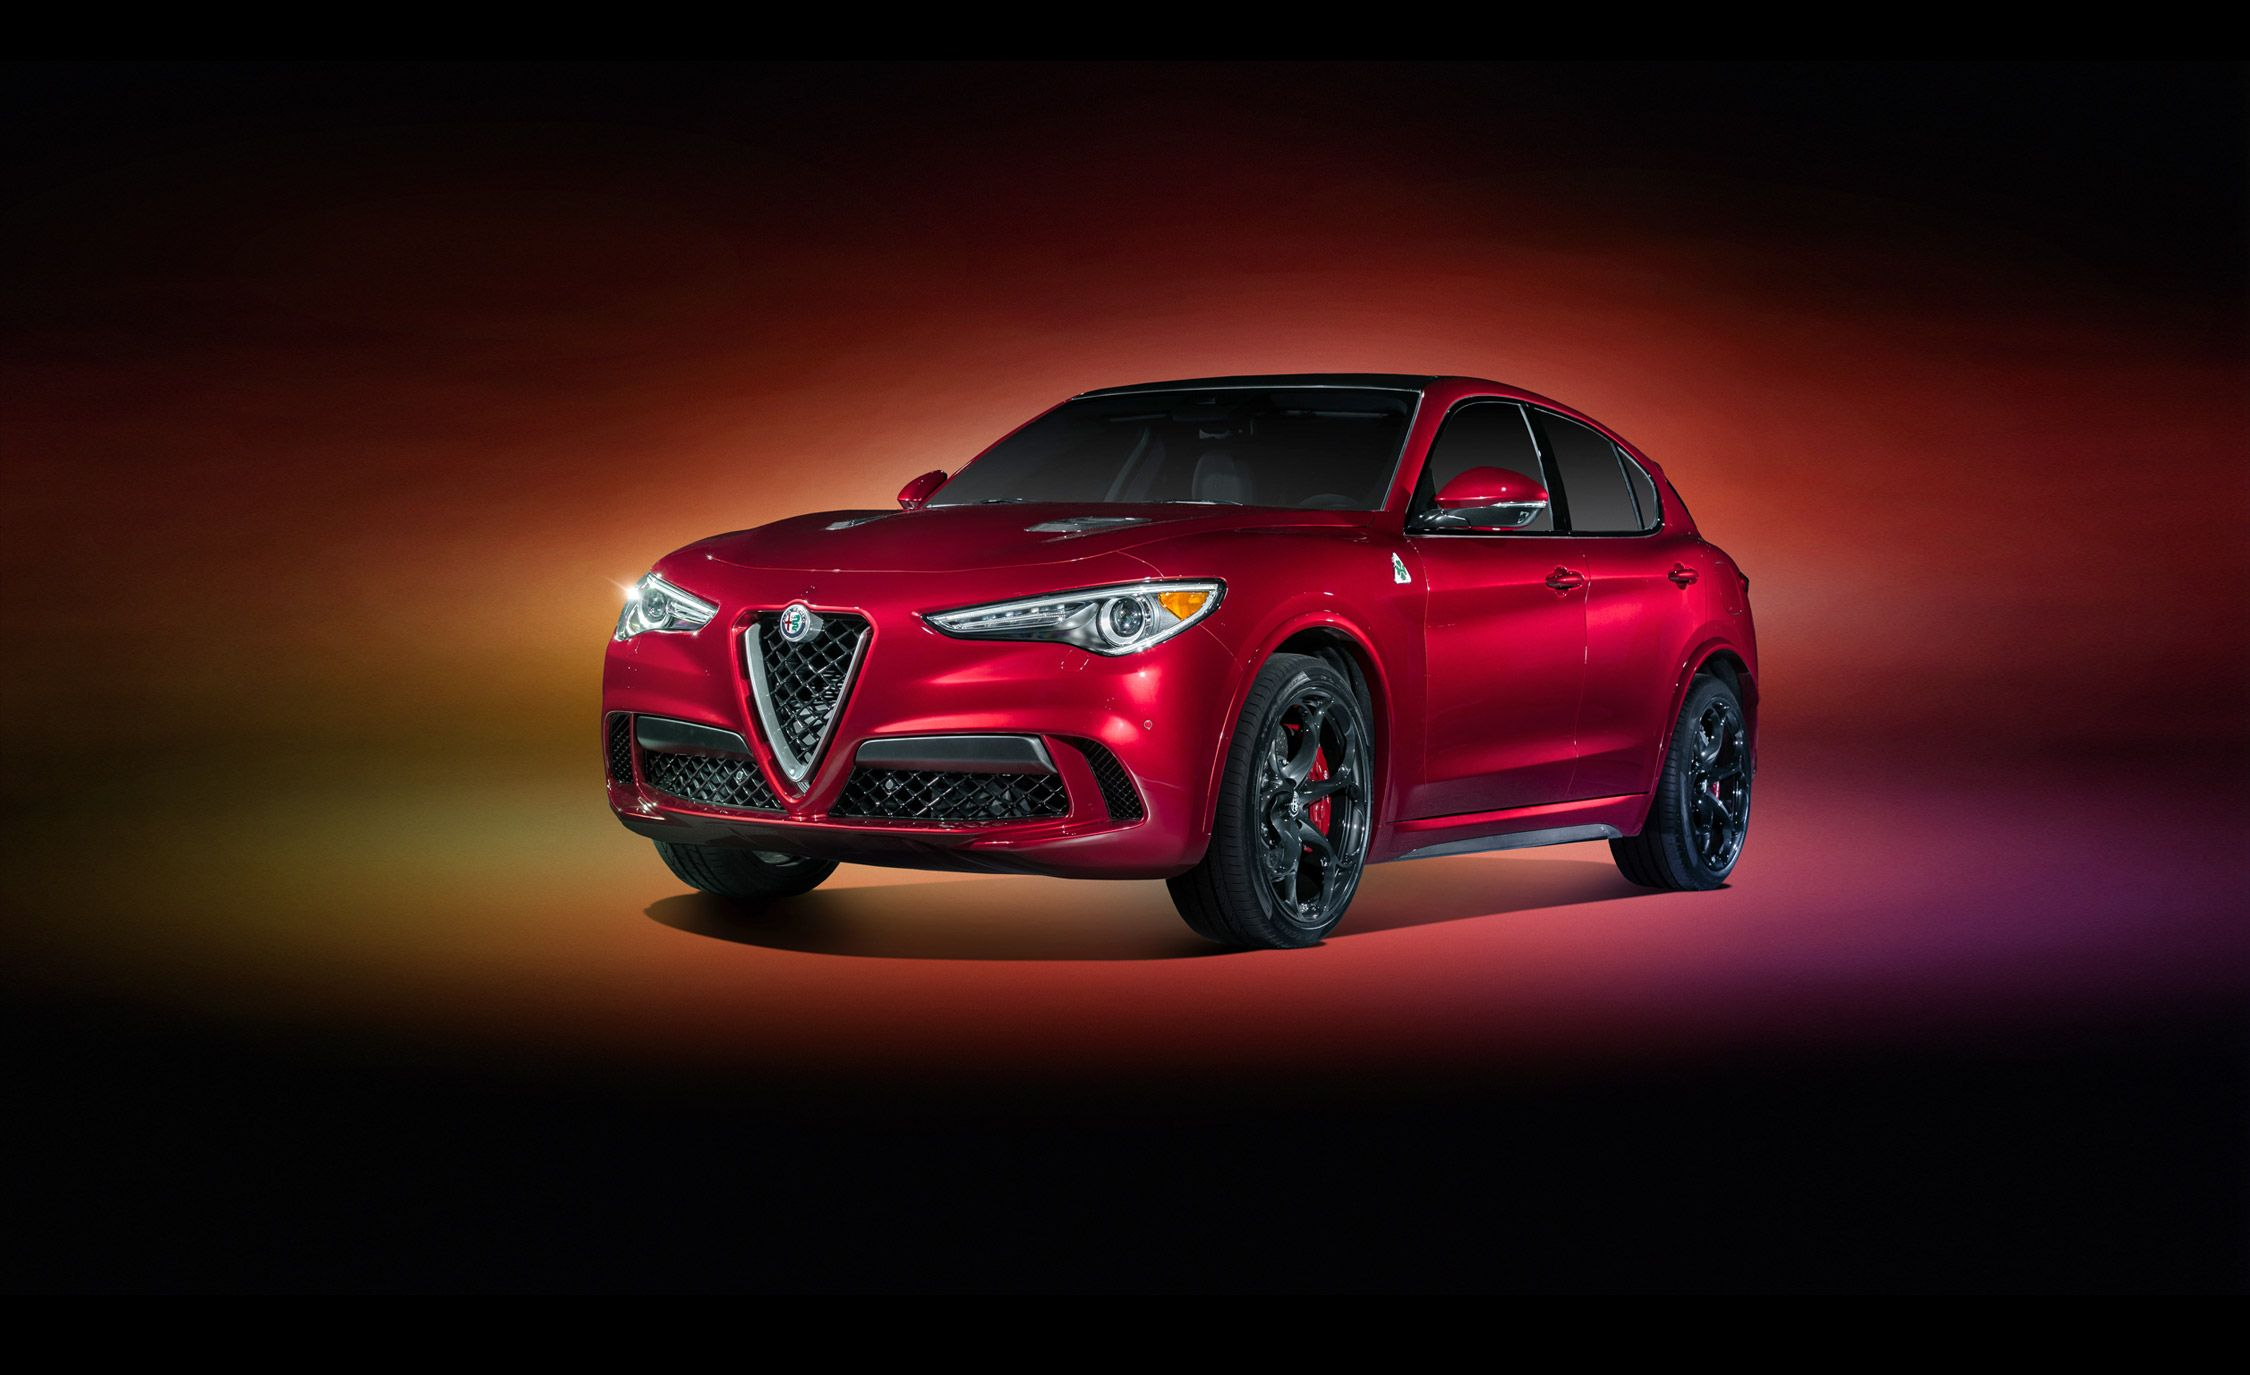 2018 Alfa Romeo Stelvio Dissected: Styling, Powertrain, and More!